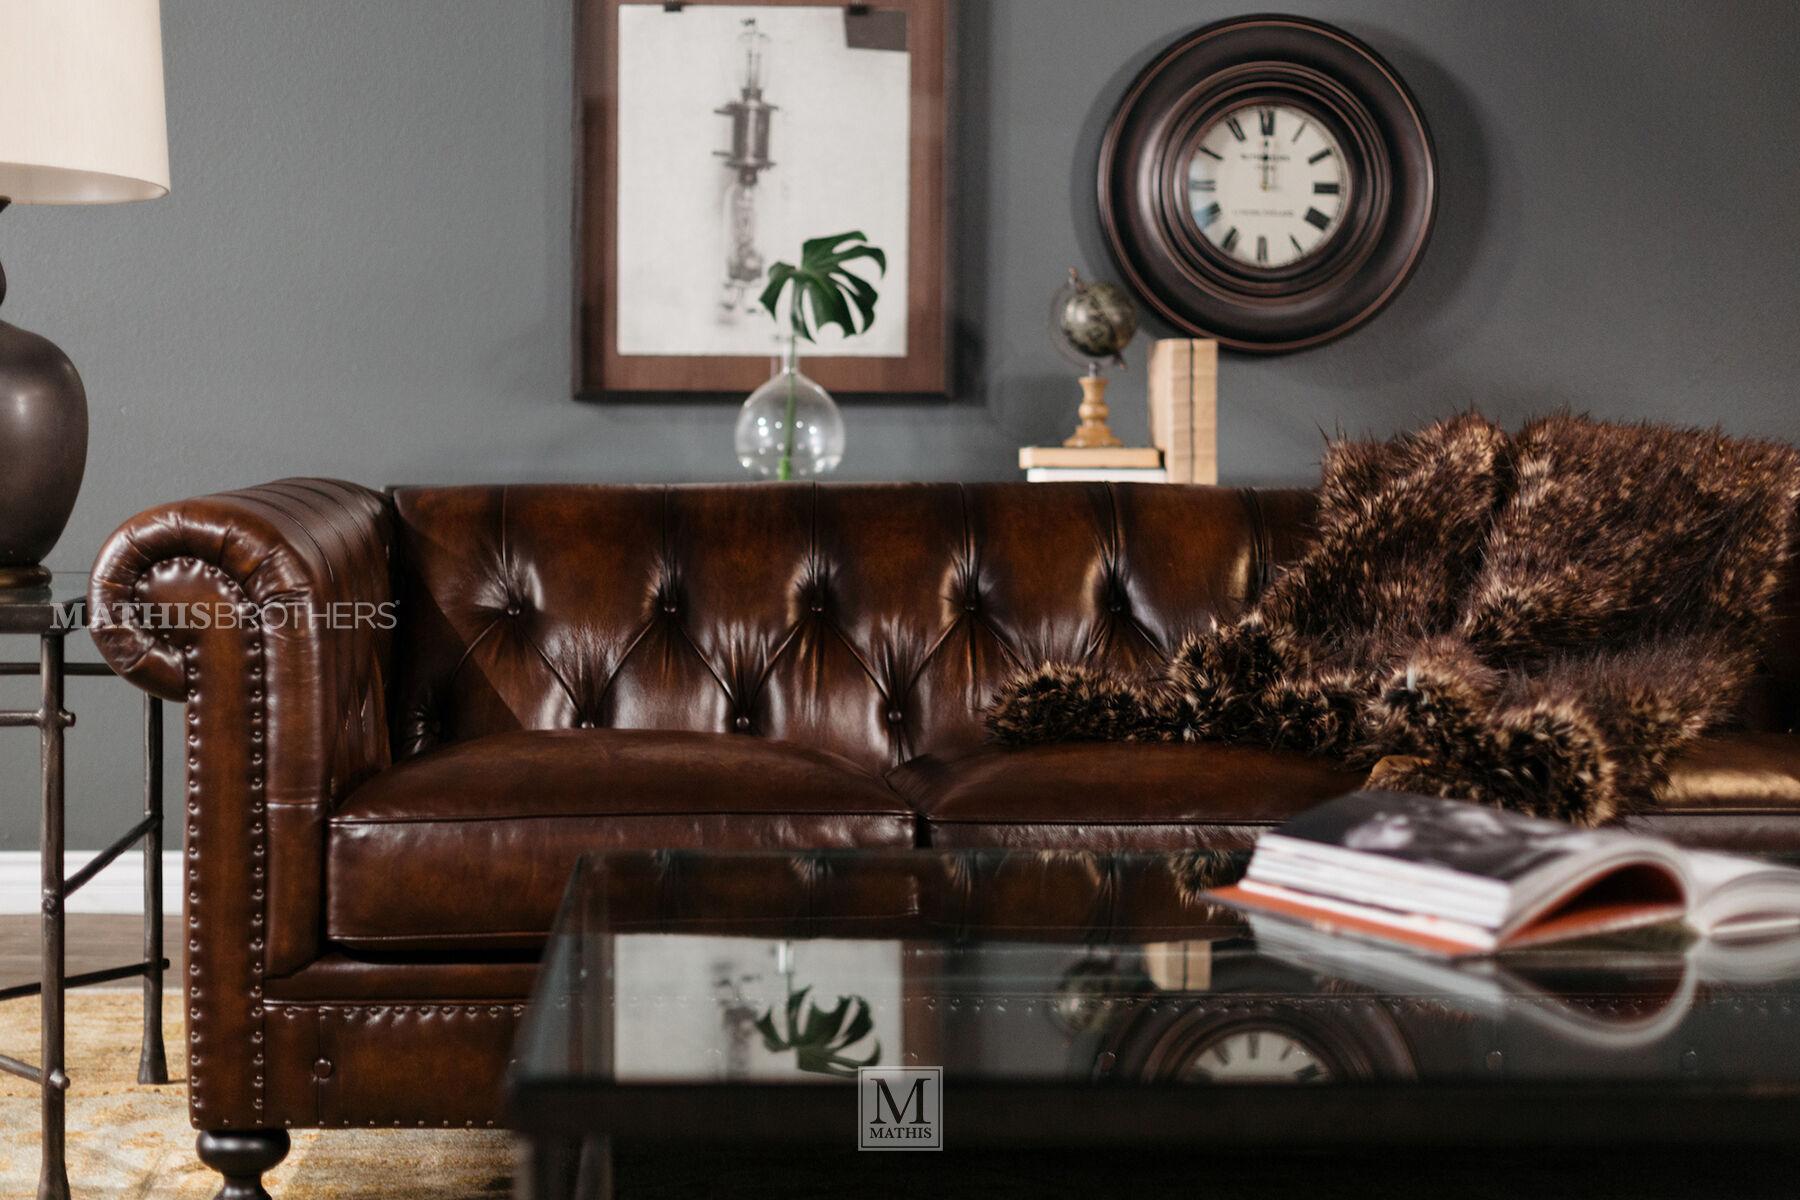 bernhardt brown leather club chair best buy computer chairs london dark sofa mathis